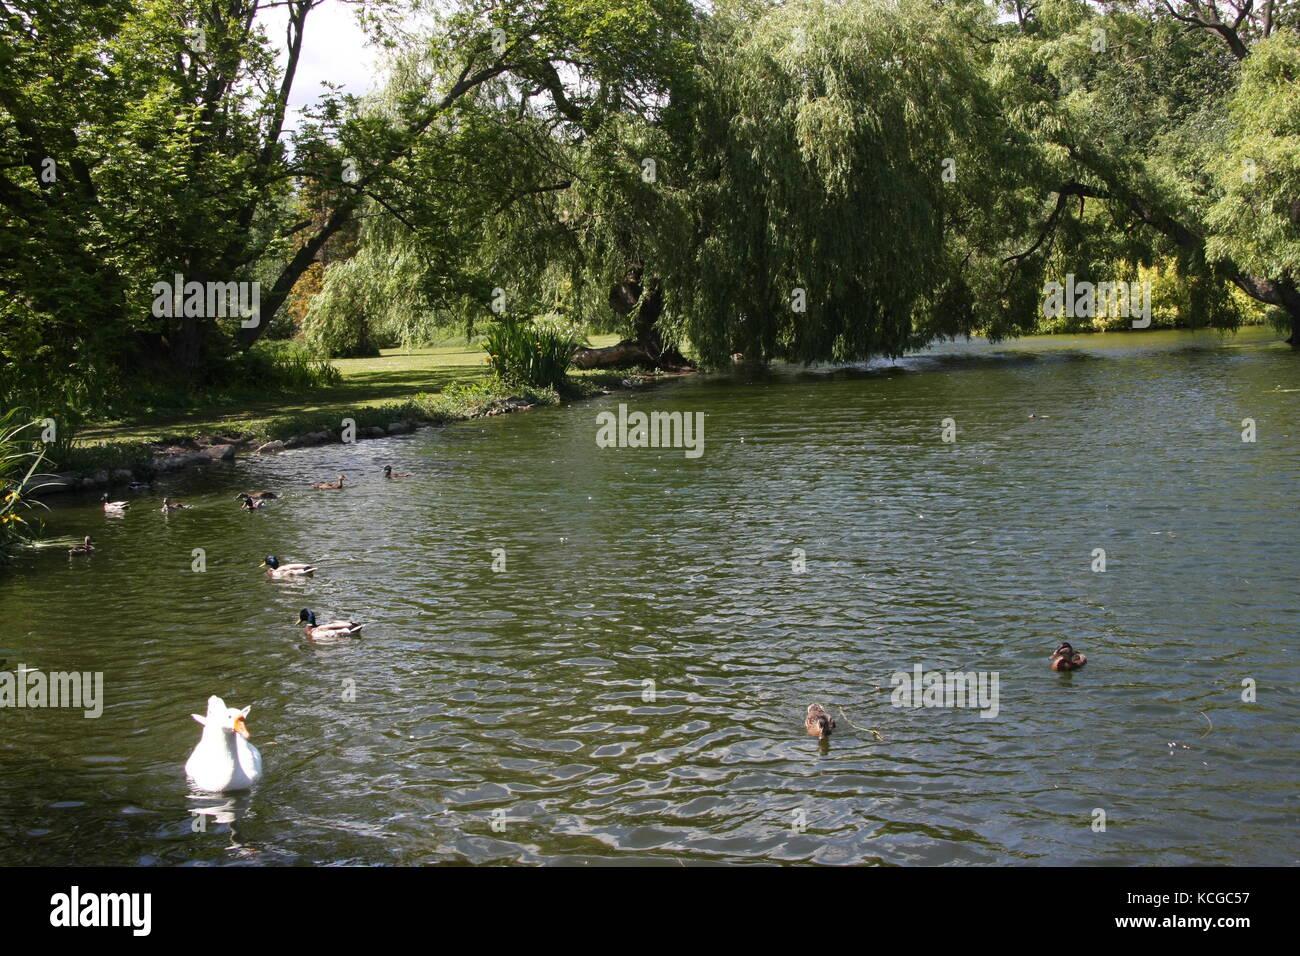 Thwaite Hall Gardens vista a Cottingham, East Yorkshire Foto Stock